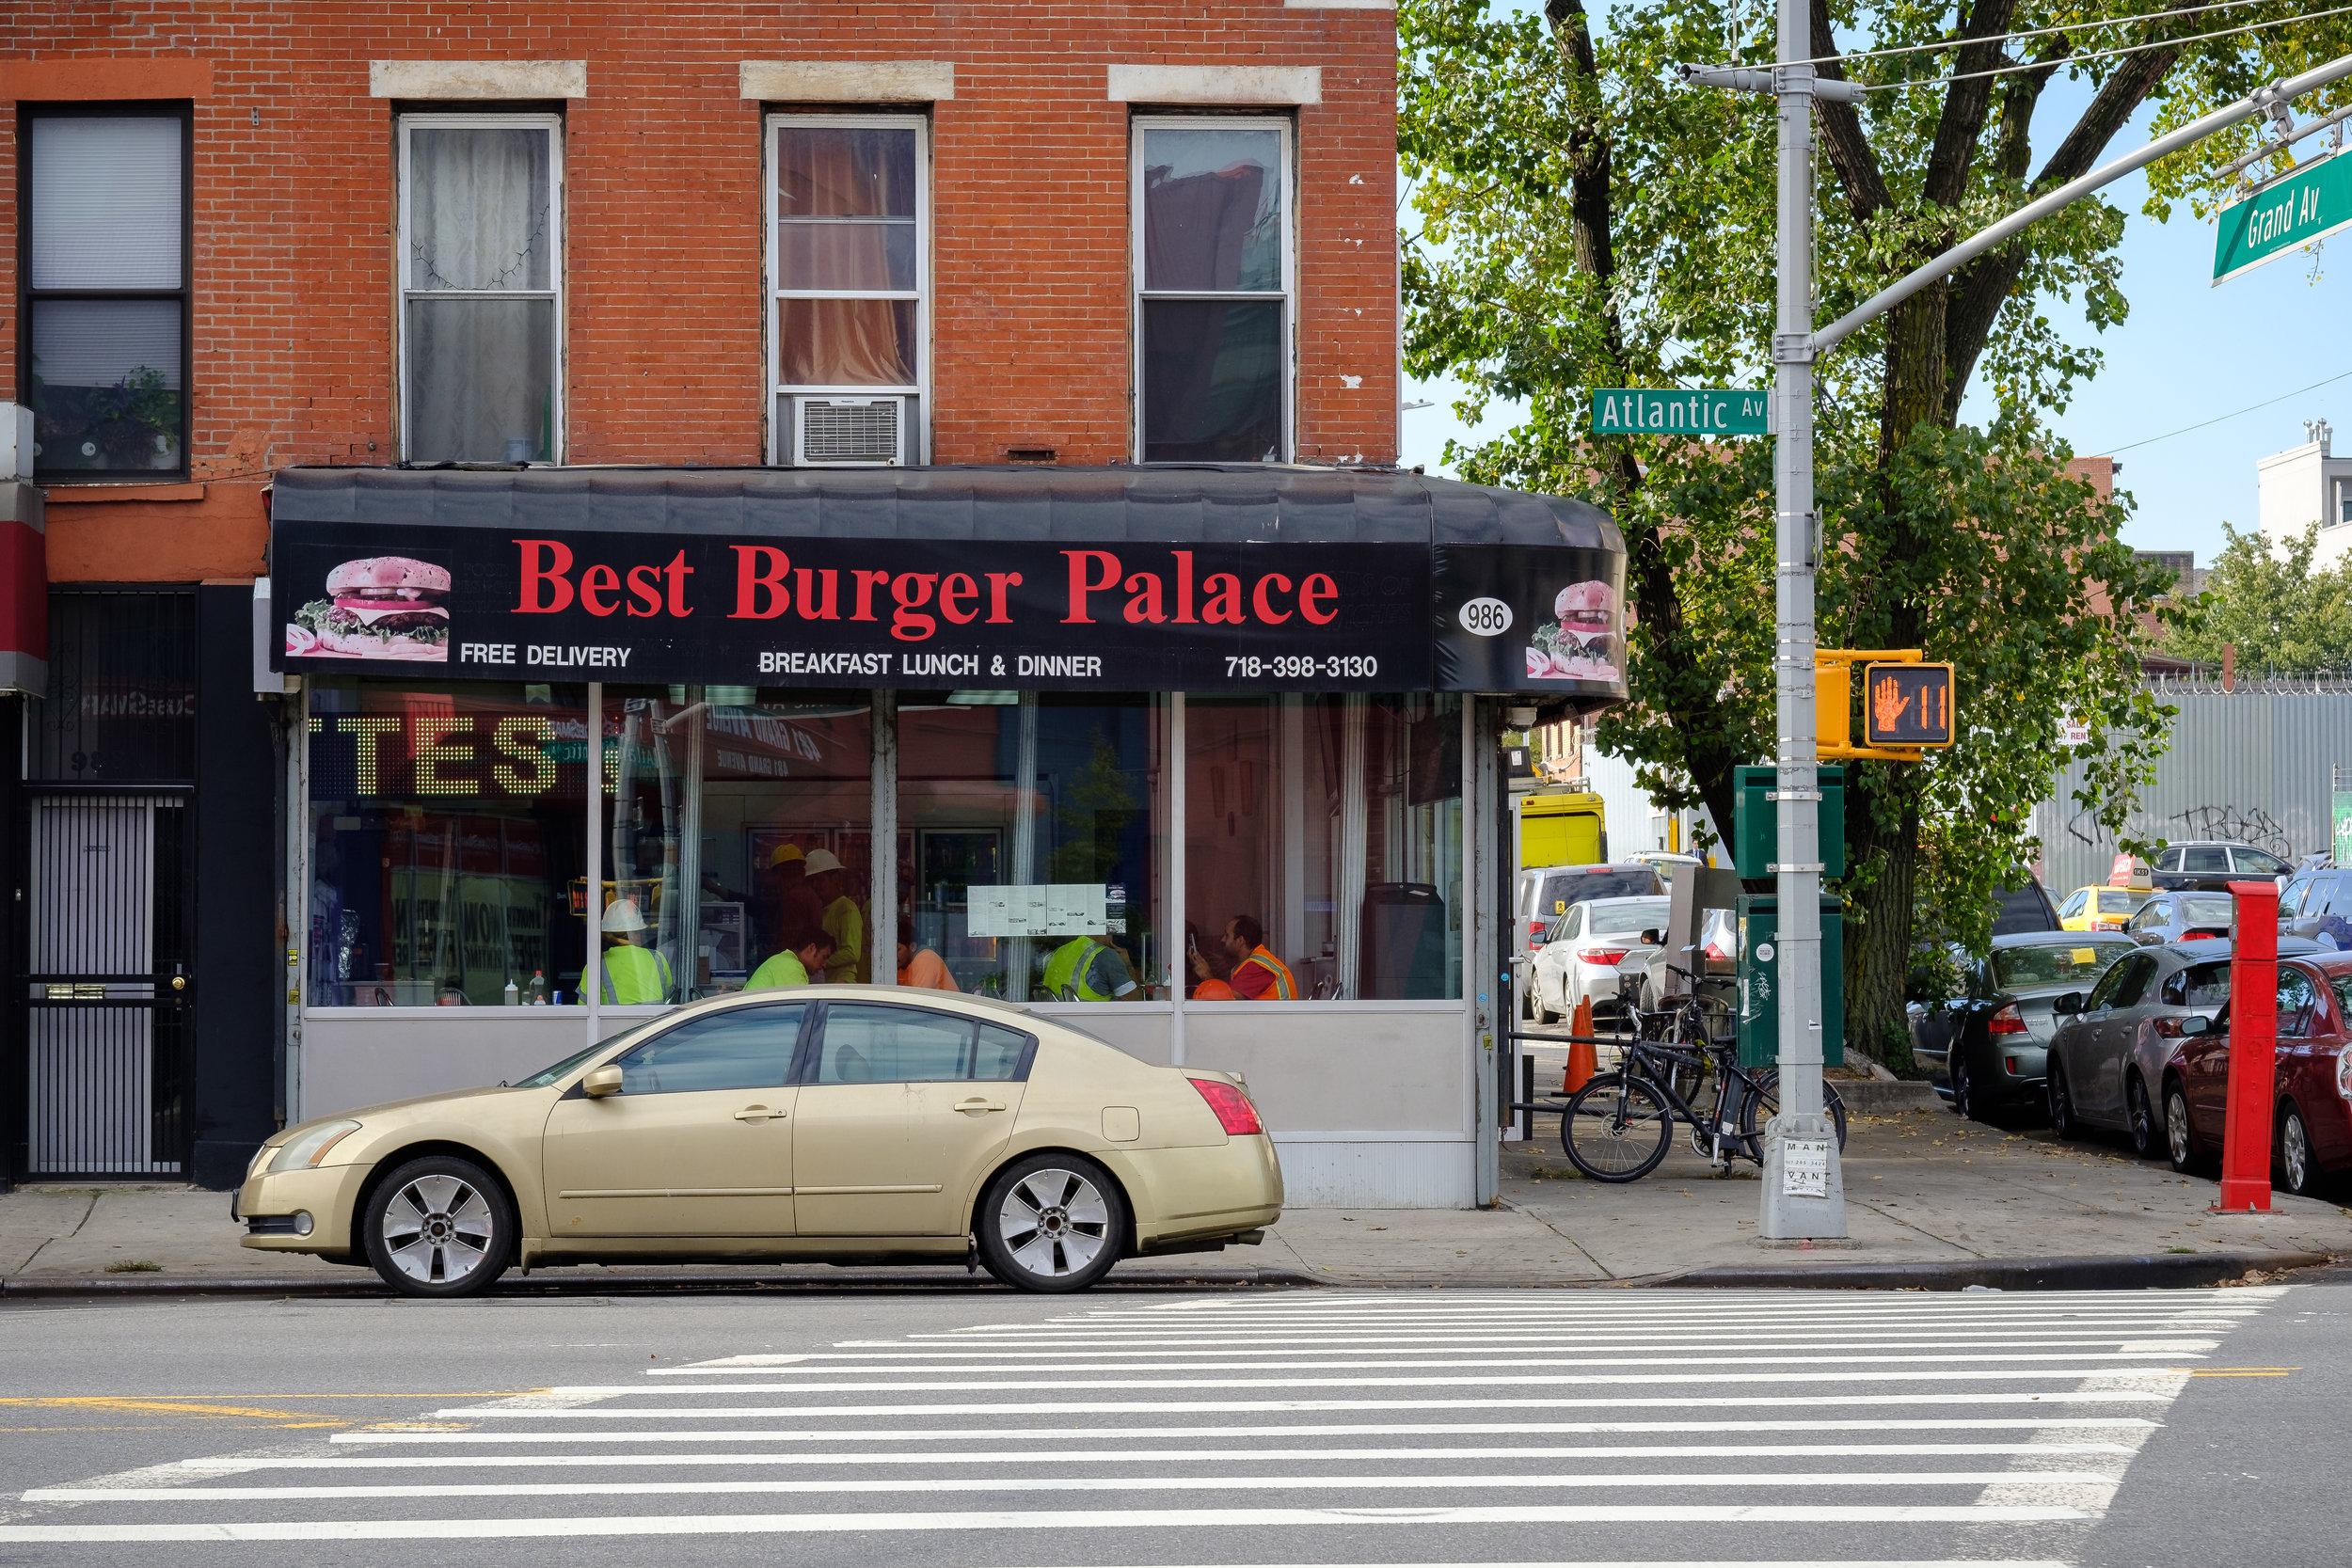 Atlantic Avenue. Prospect Heights, Brooklyn.